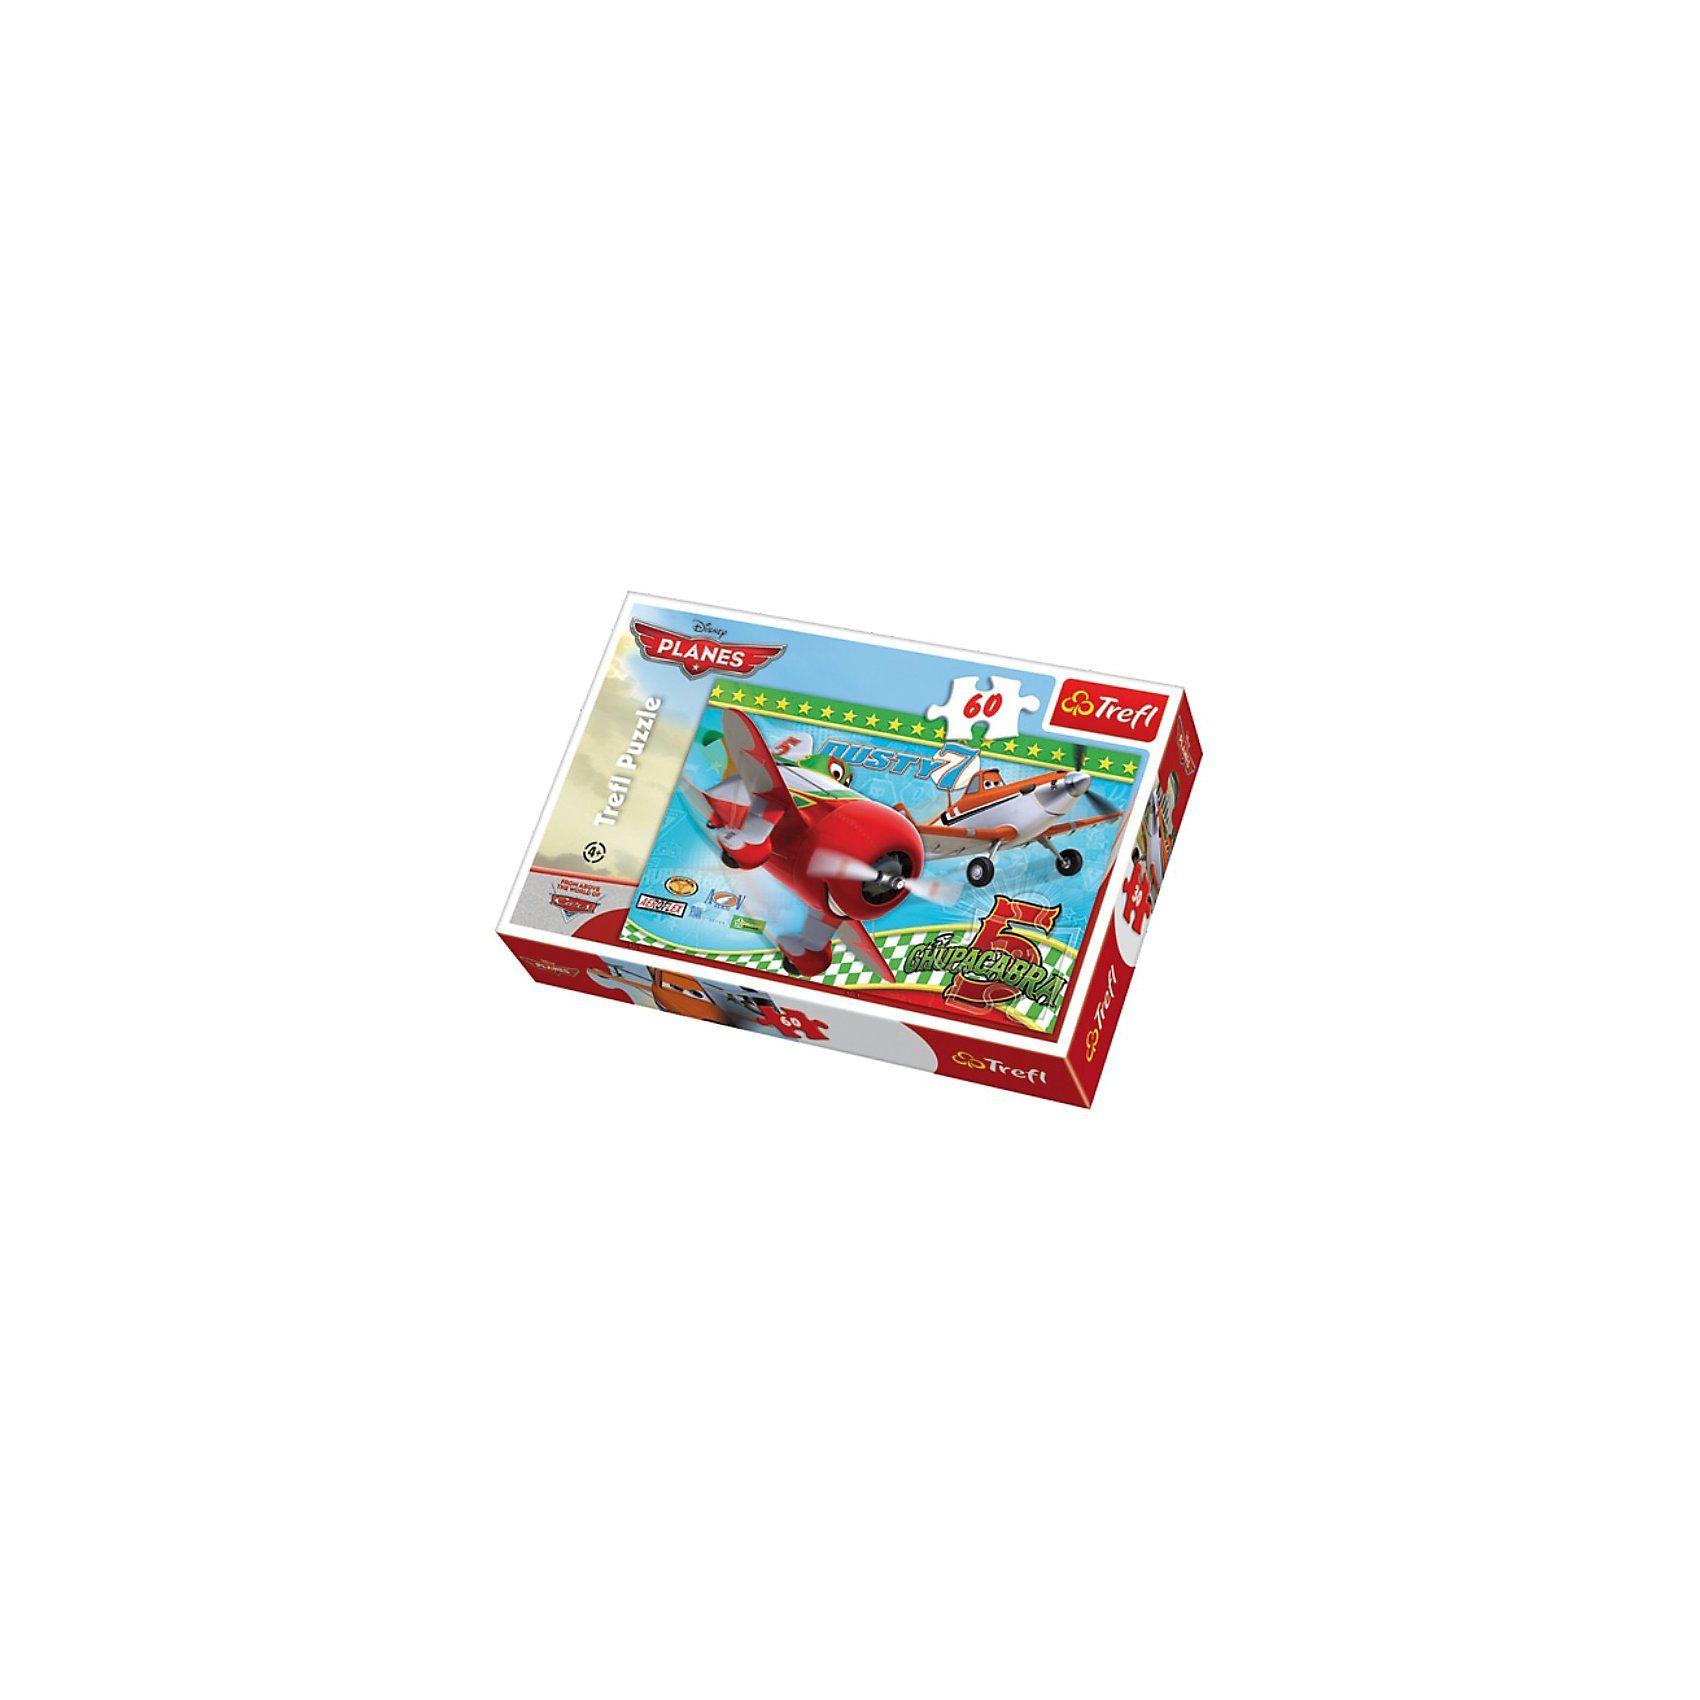 Trefl Puzzle 60 Teile - Planes